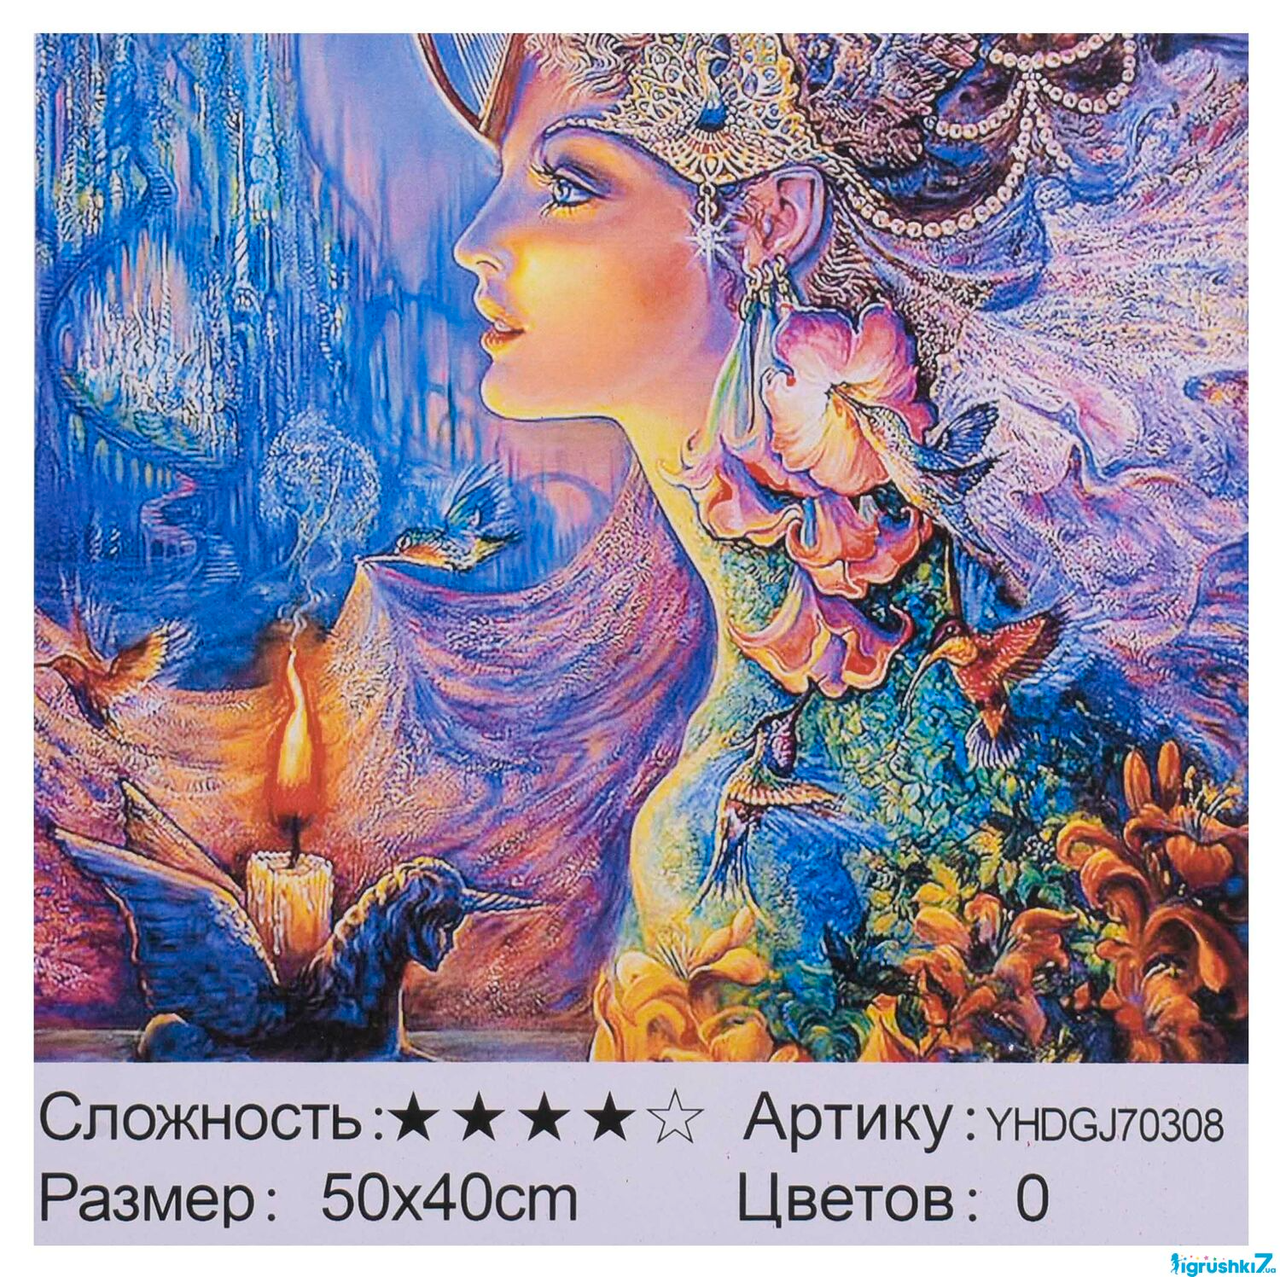 Картина по номерам + Алмазная мозаика 2в1 YHDGJ 70308 50х40см. Раскраска фэнтези